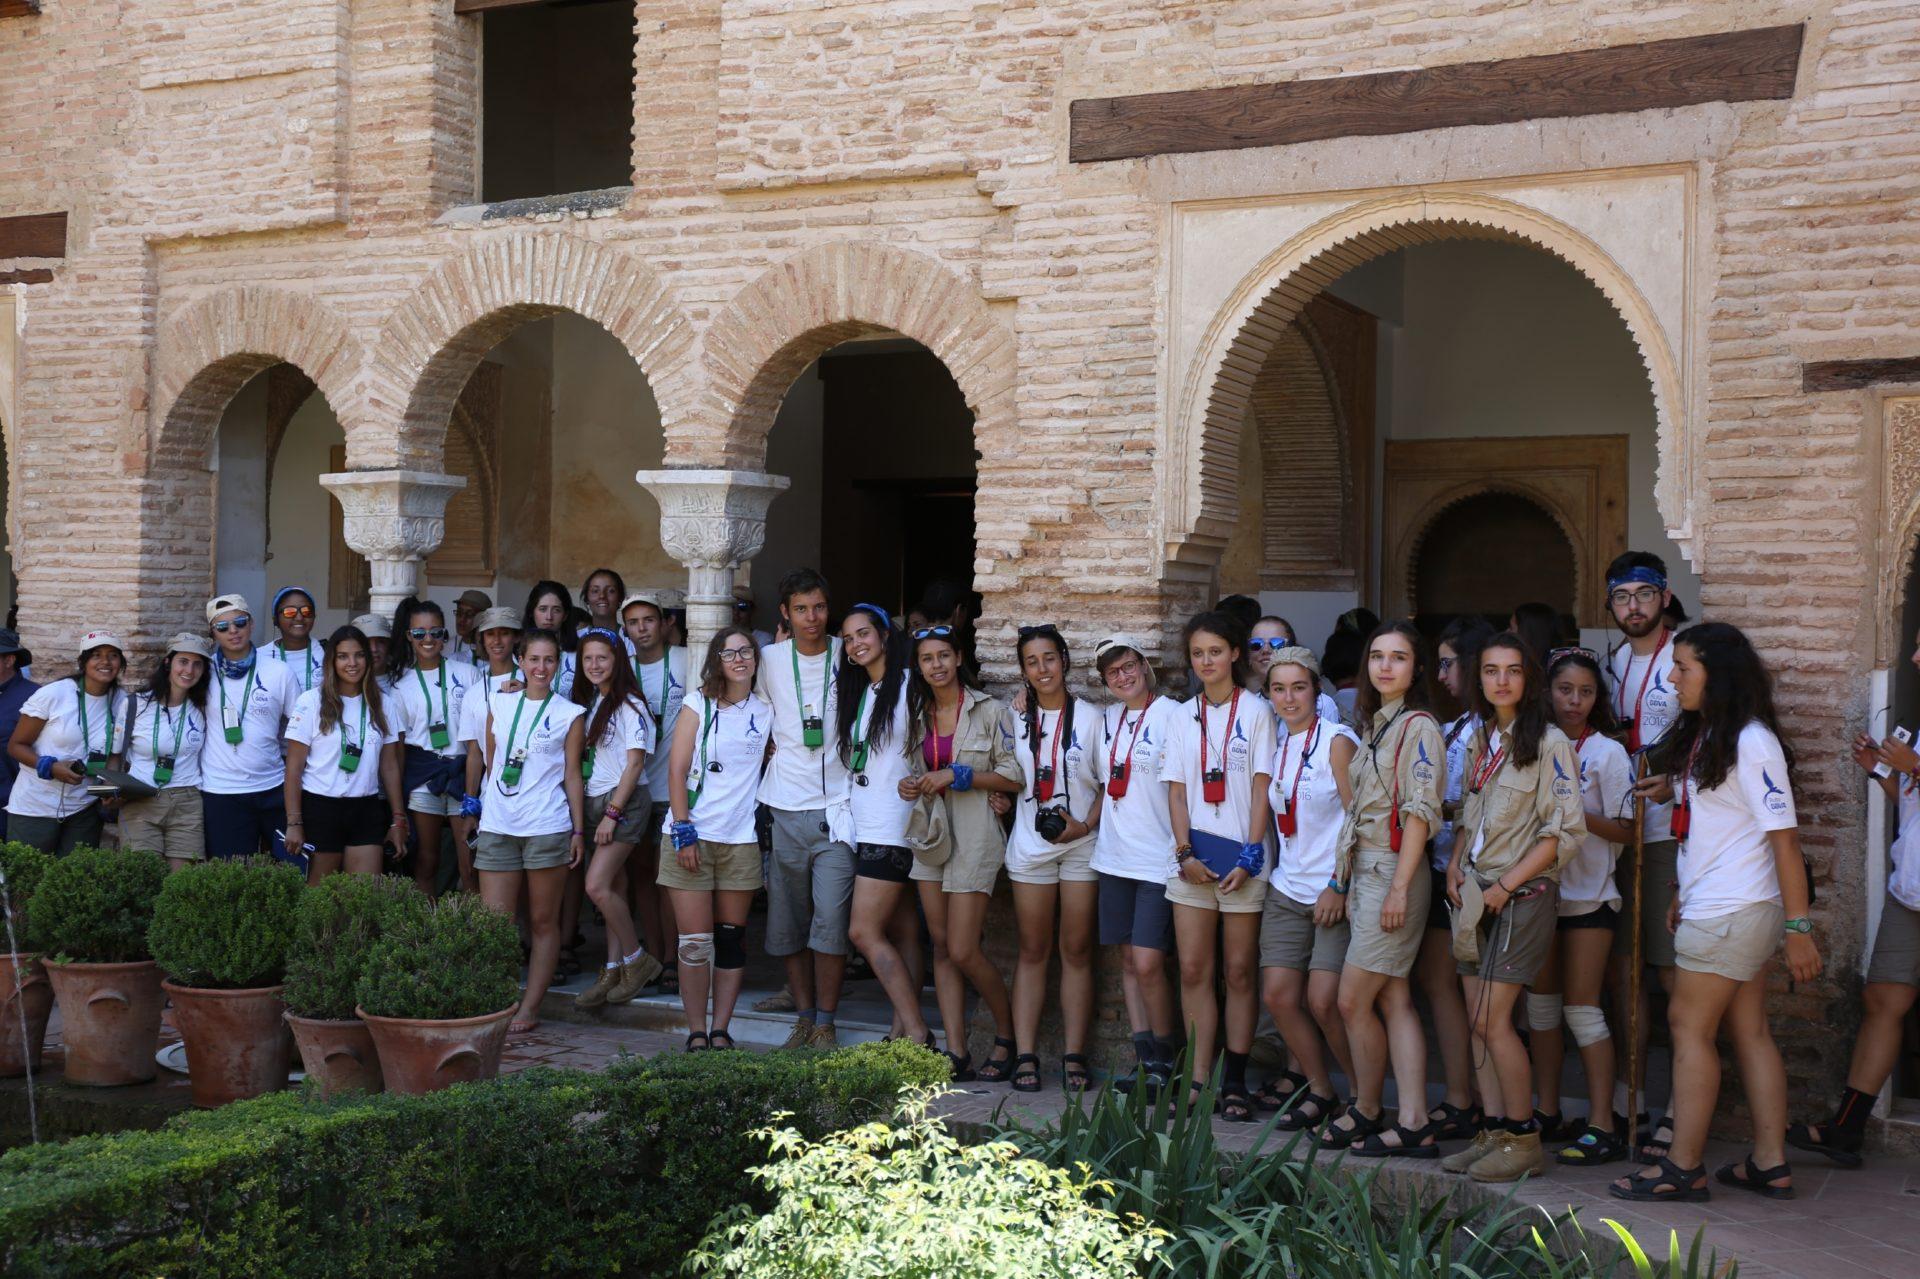 Ruta BBVA en los jardines del Generalife de la Alhambra , Granada 2